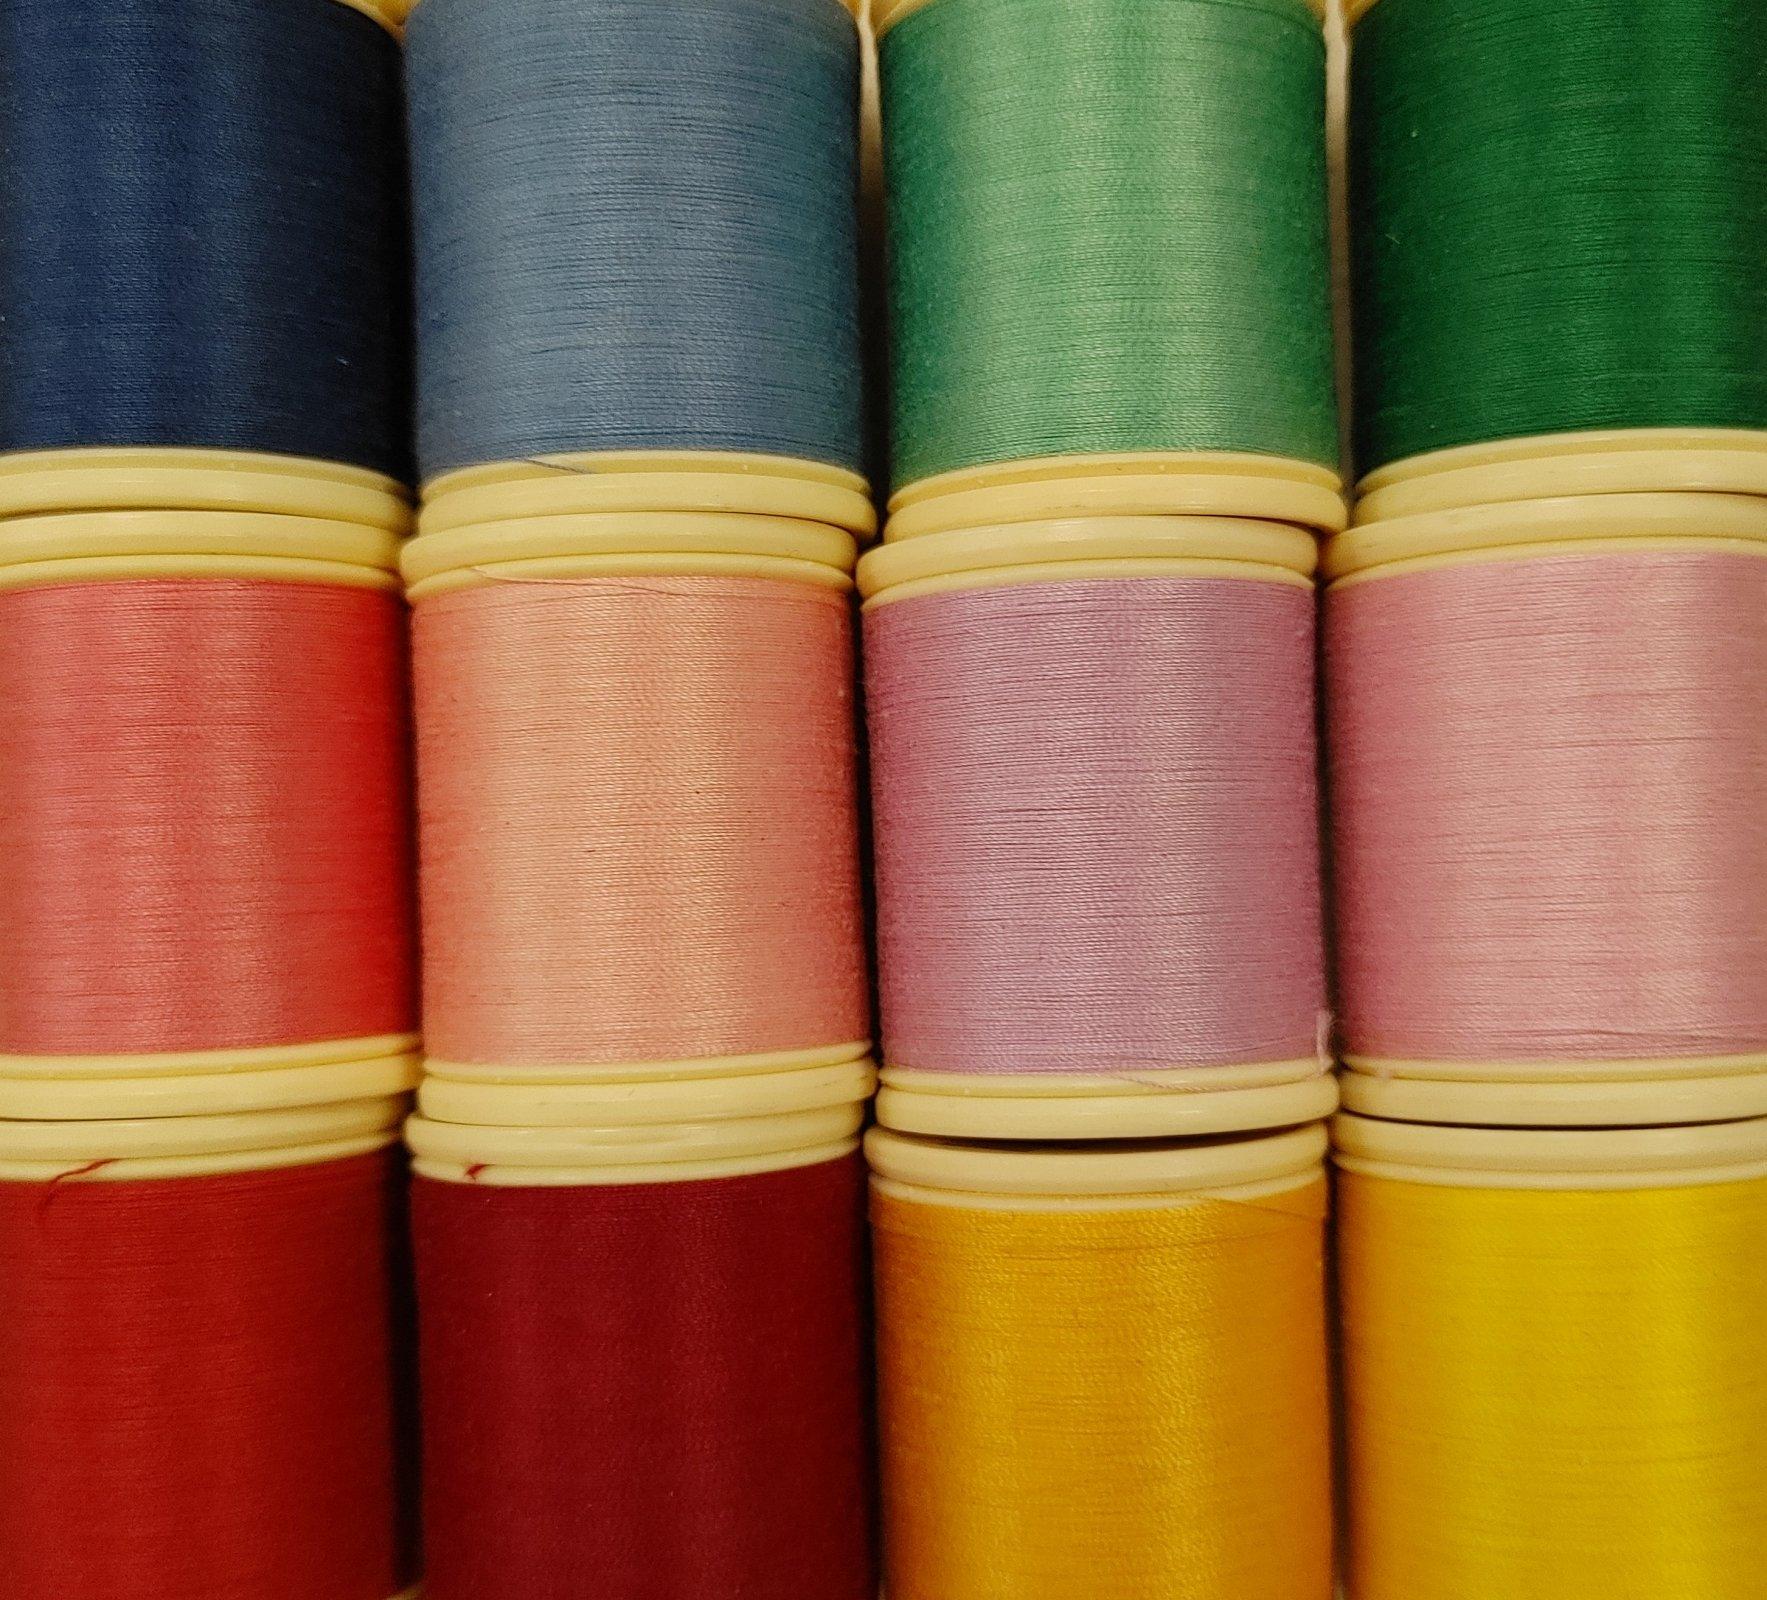 DMC Rainbow 12 spool set of 50wt cotton